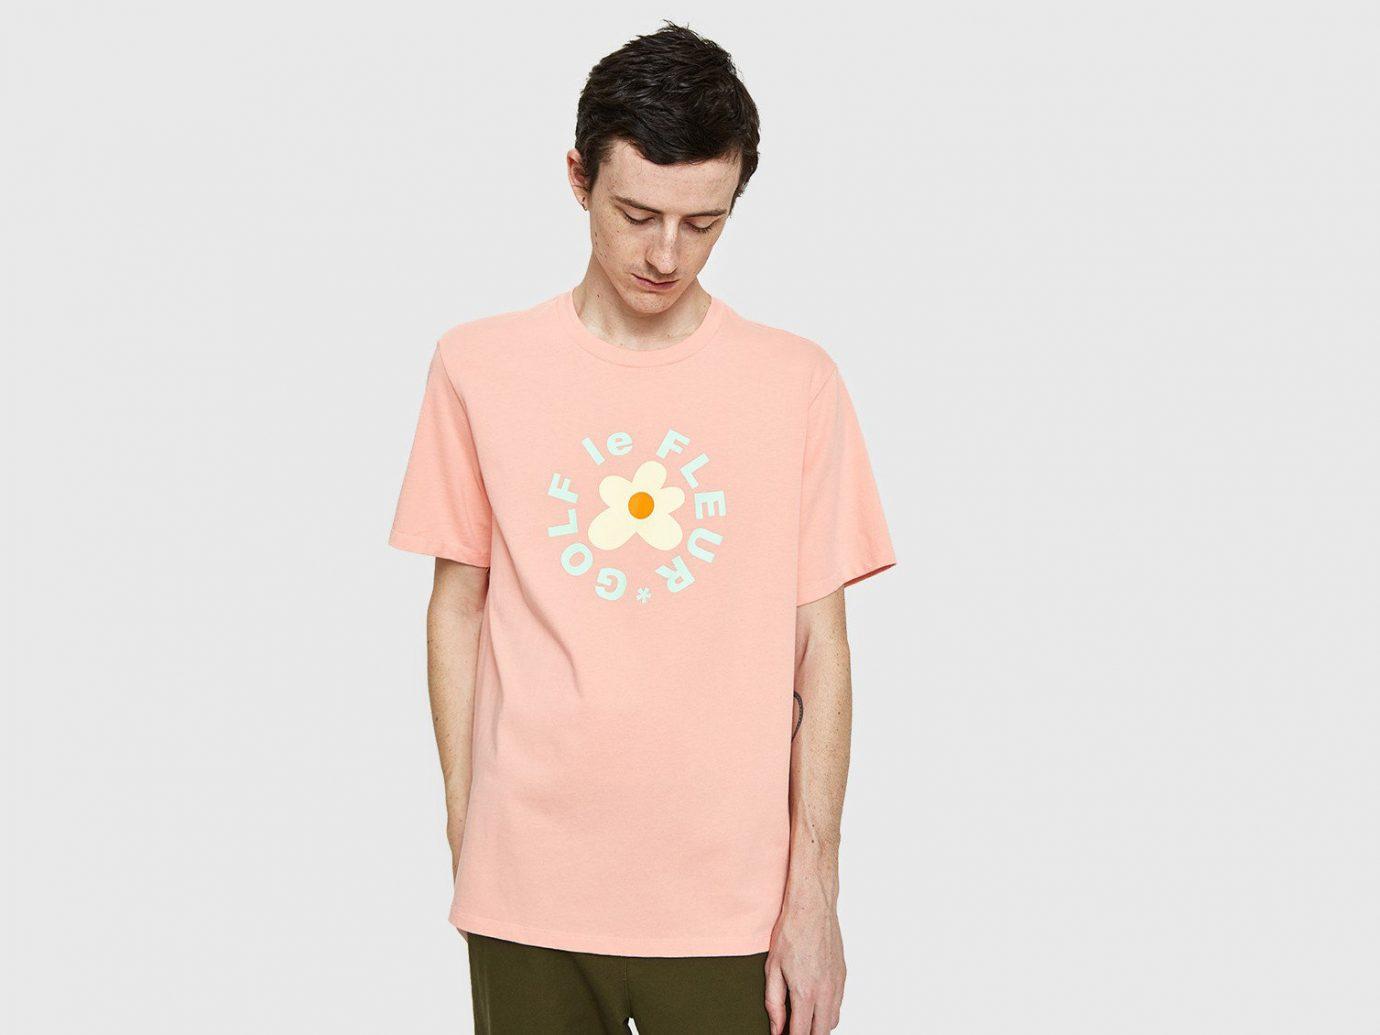 Spring Travel Style + Design Summer Travel Travel Shop t shirt clothing pink sleeve shoulder neck joint peach top pattern beige